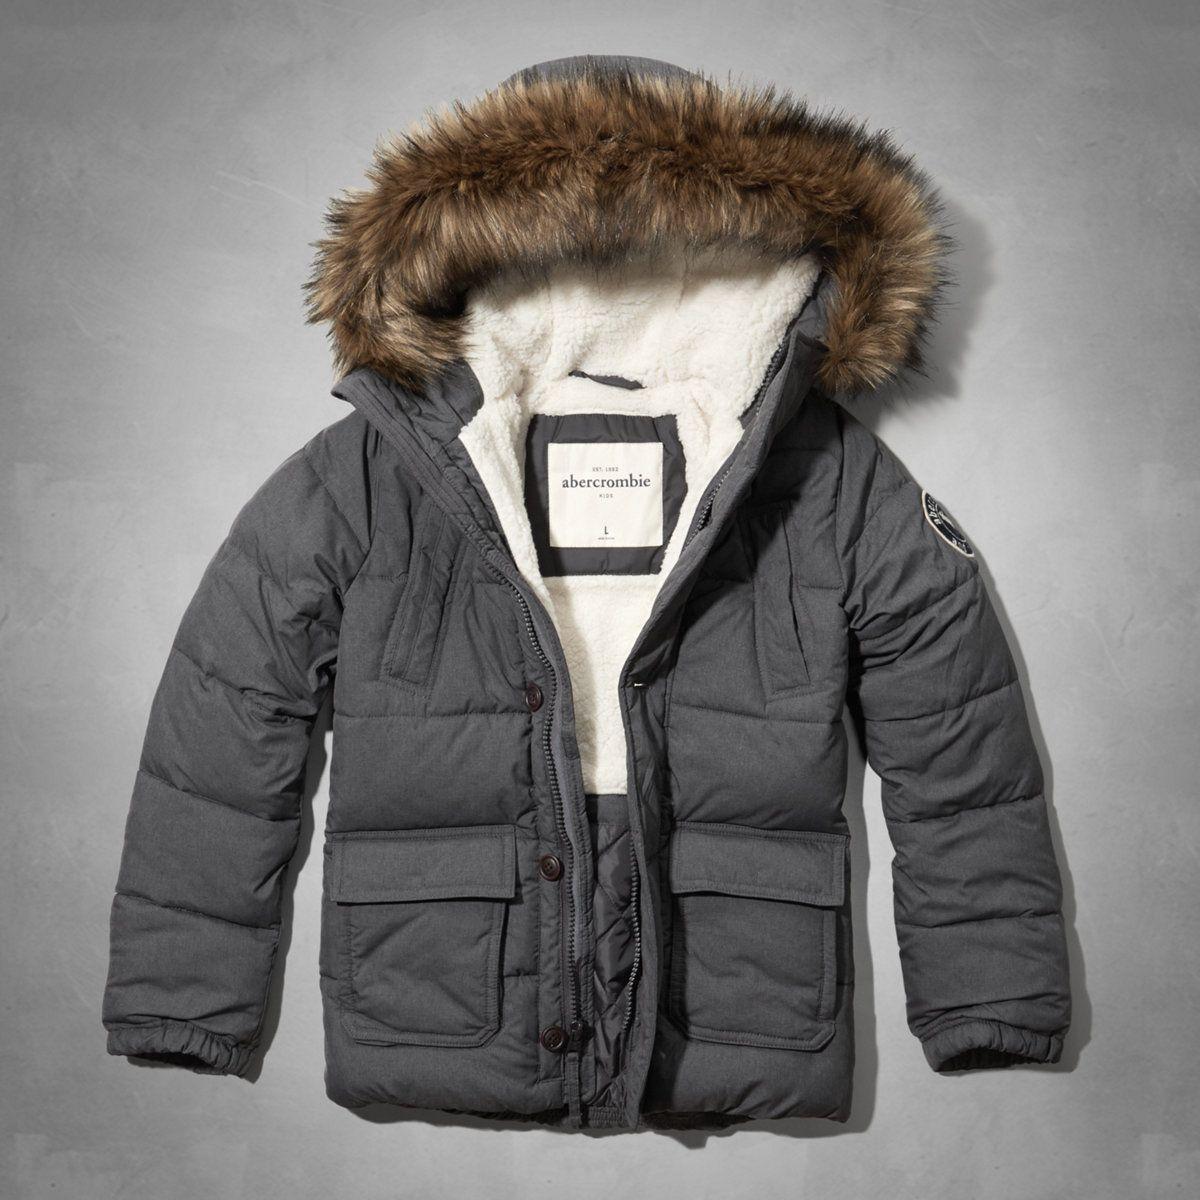 Boys Sherpa Lined Puffer Jacket Boys New Arrivals Abercrombiekids Com Boys Jacket Boy Outerwear Boys Coat [ 1200 x 1200 Pixel ]